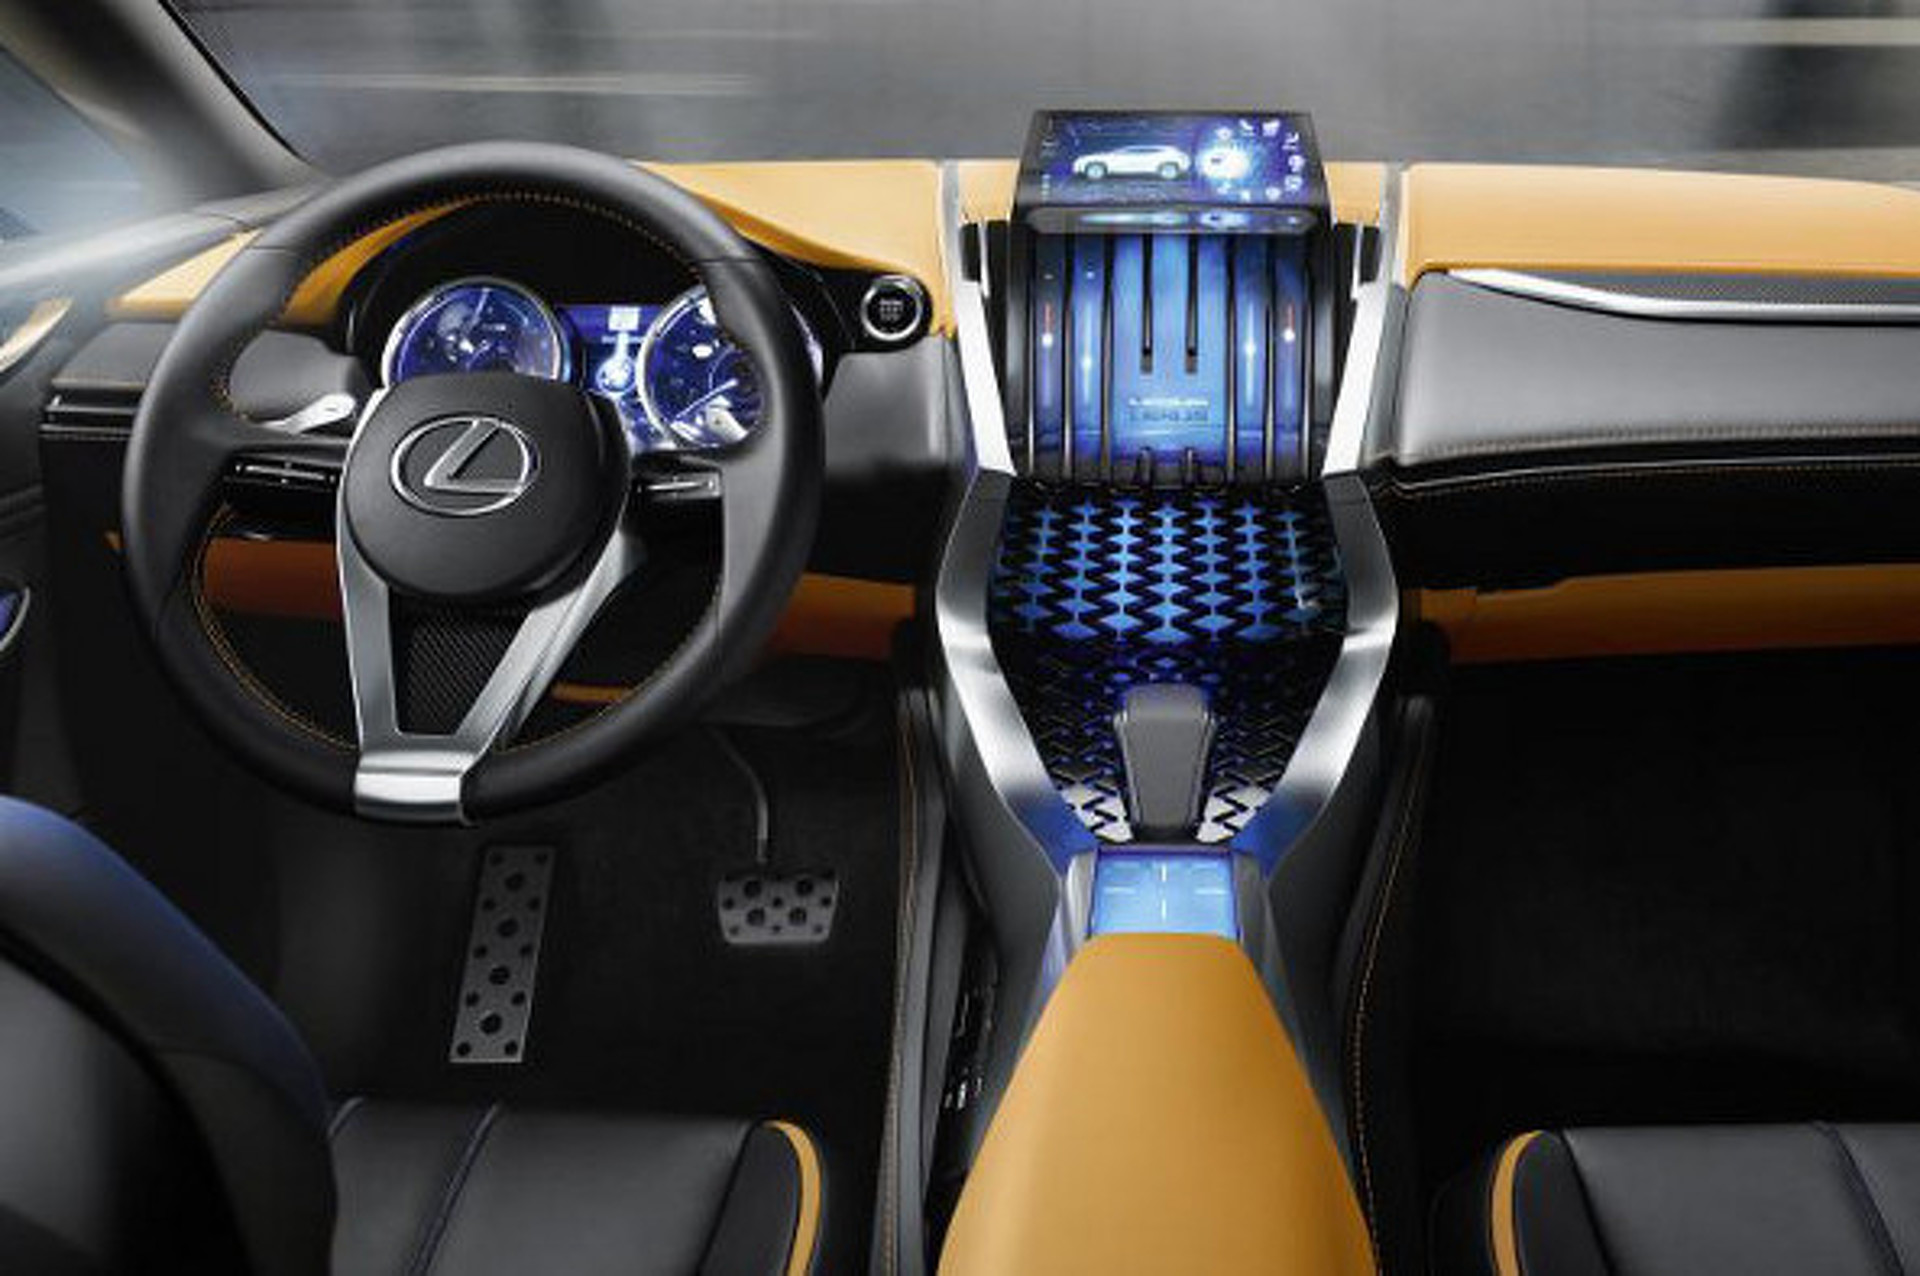 Lexus Lf Nx >> The Lexus Lf Nx Concept A City Dwelling Suv Of The Future